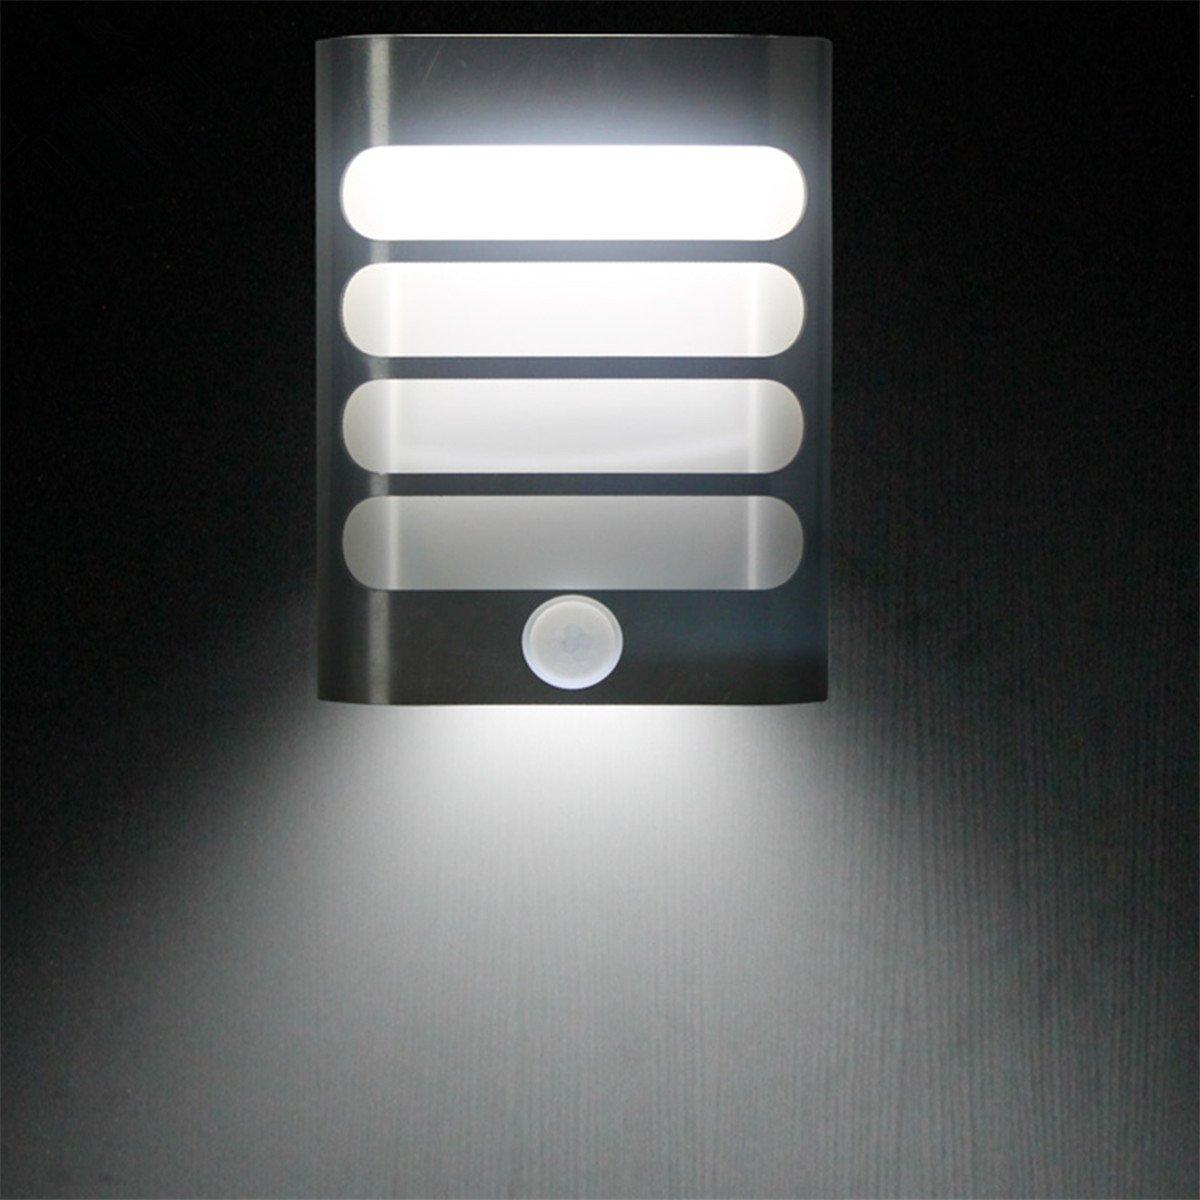 Motion Sensor LED Wall Lamp,Luxury Aluminum Night Light Stick Anywhere Energy-Saving Auto On/Off for Hallway, Closet,Cabinet,Garden,Kids Room Sconces (White)